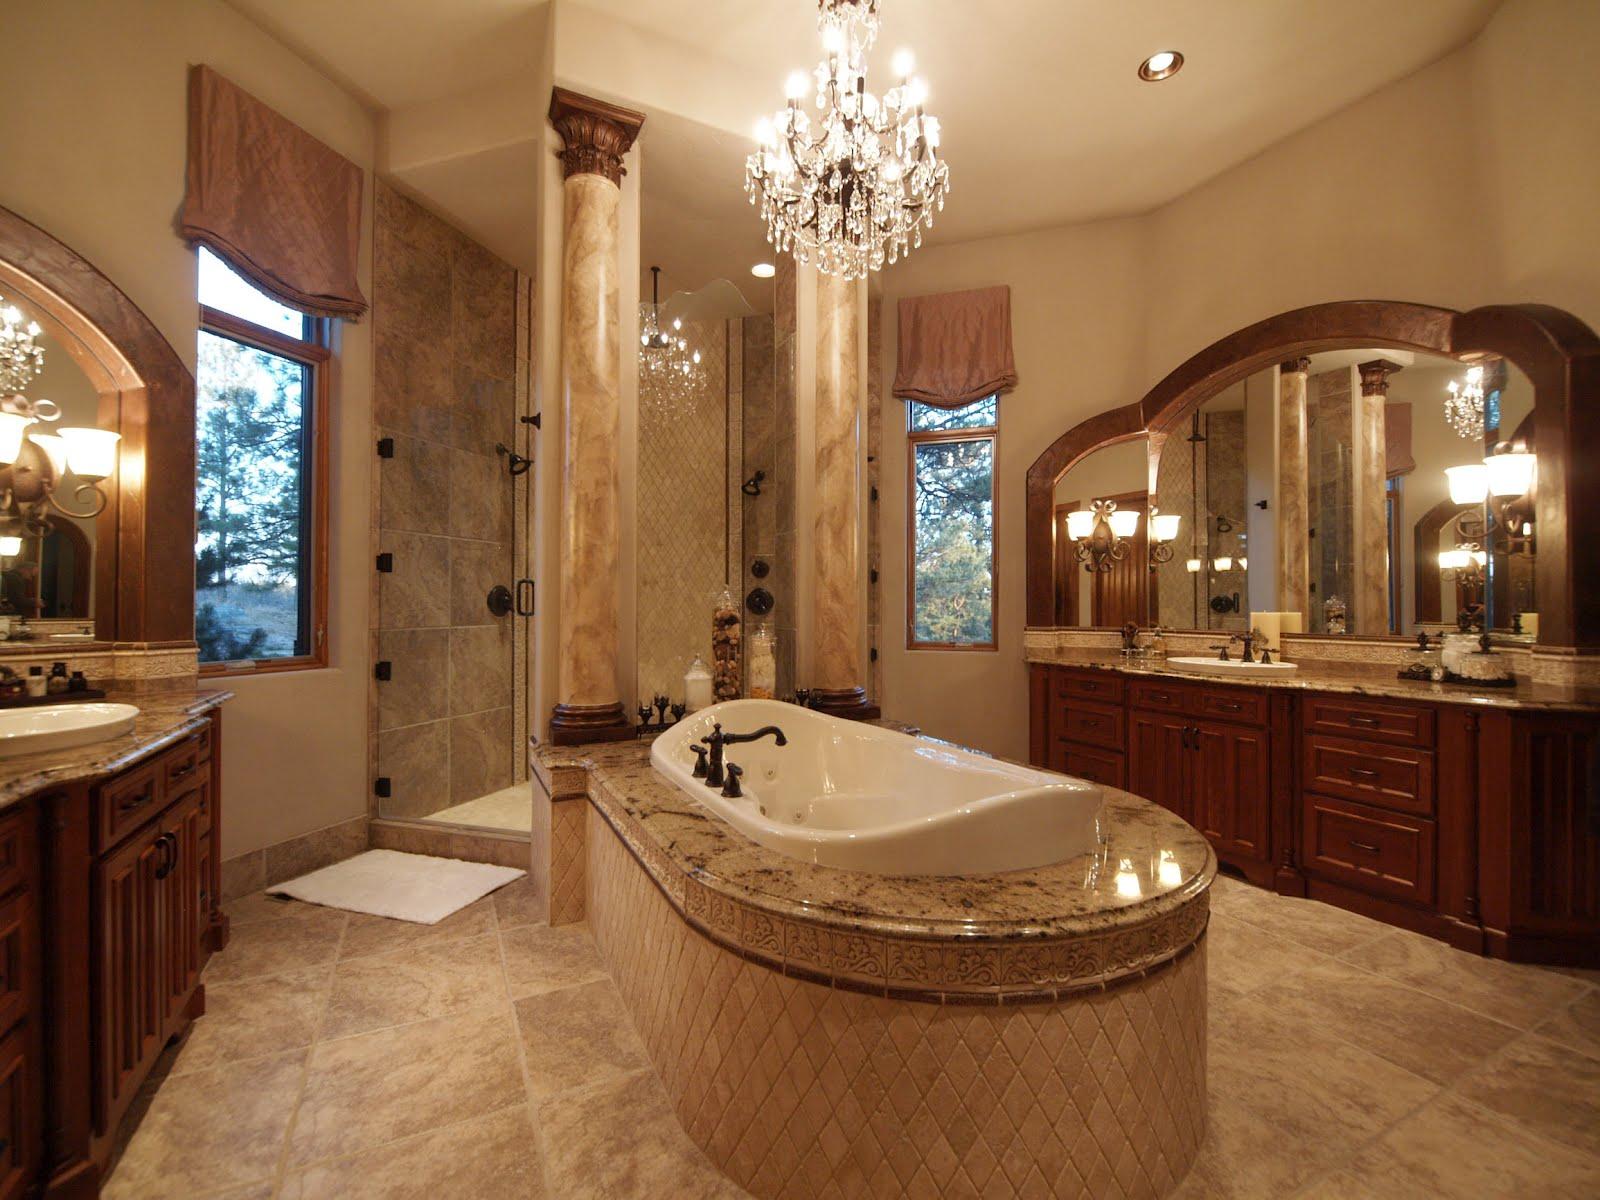 Dream master bathrooms tubs - Dream Master Bathrooms Dream Master Bathrooms Tubs